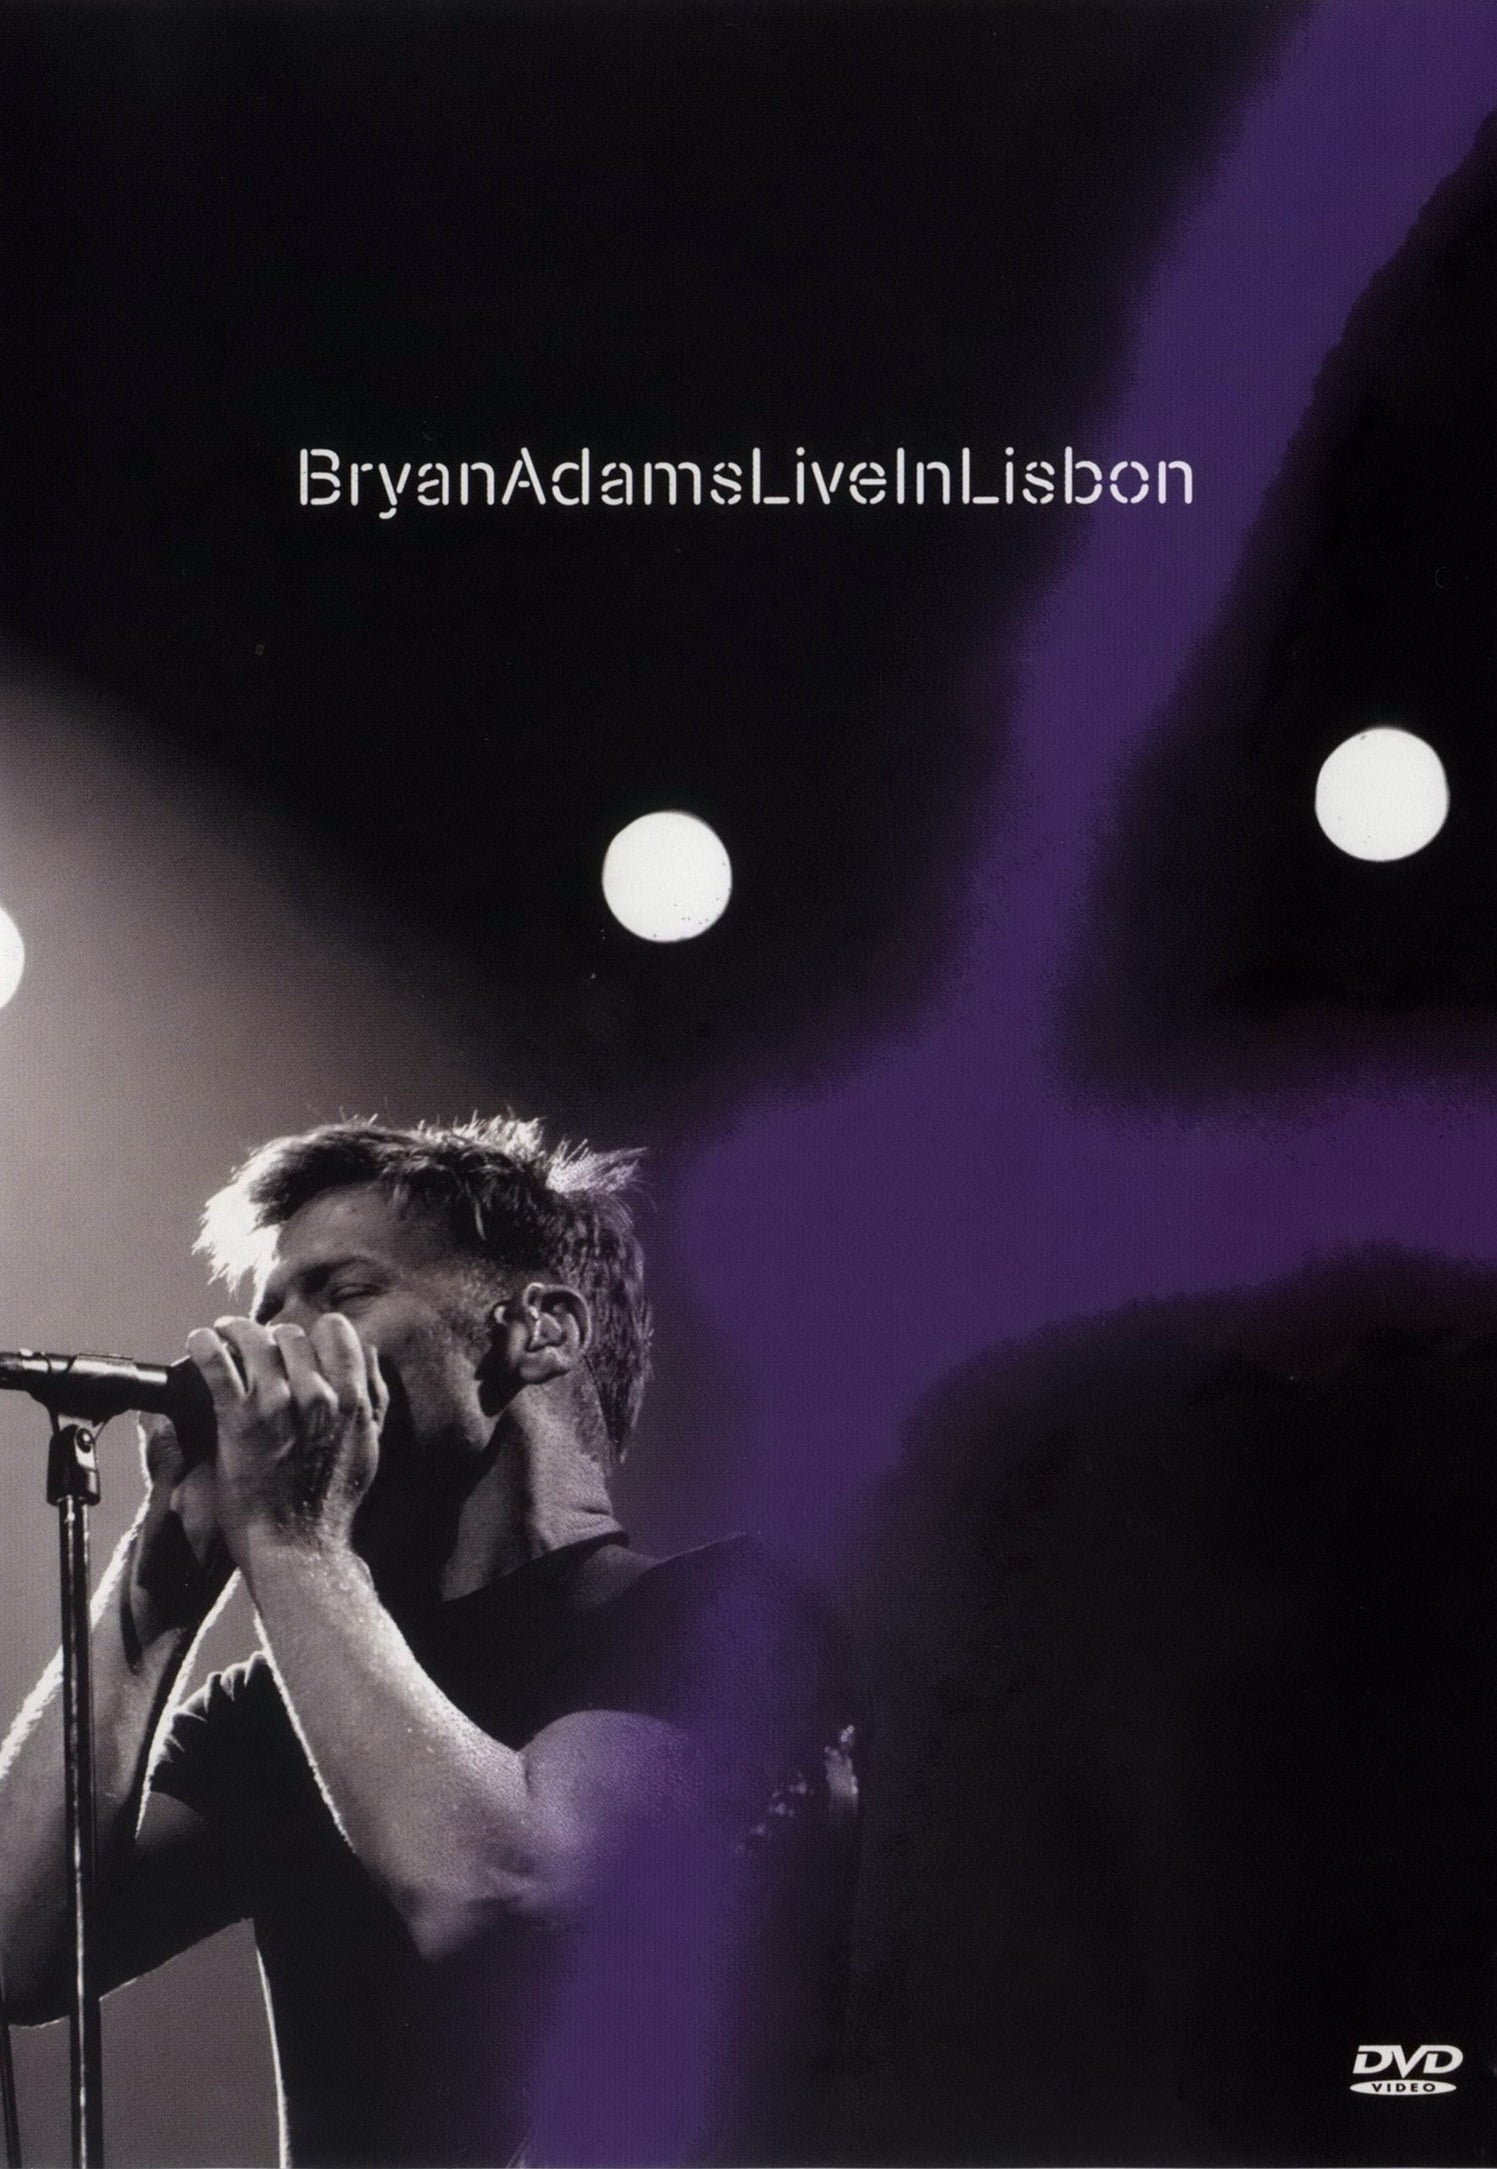 Bryan Adams - Live in Lisbon (2005)